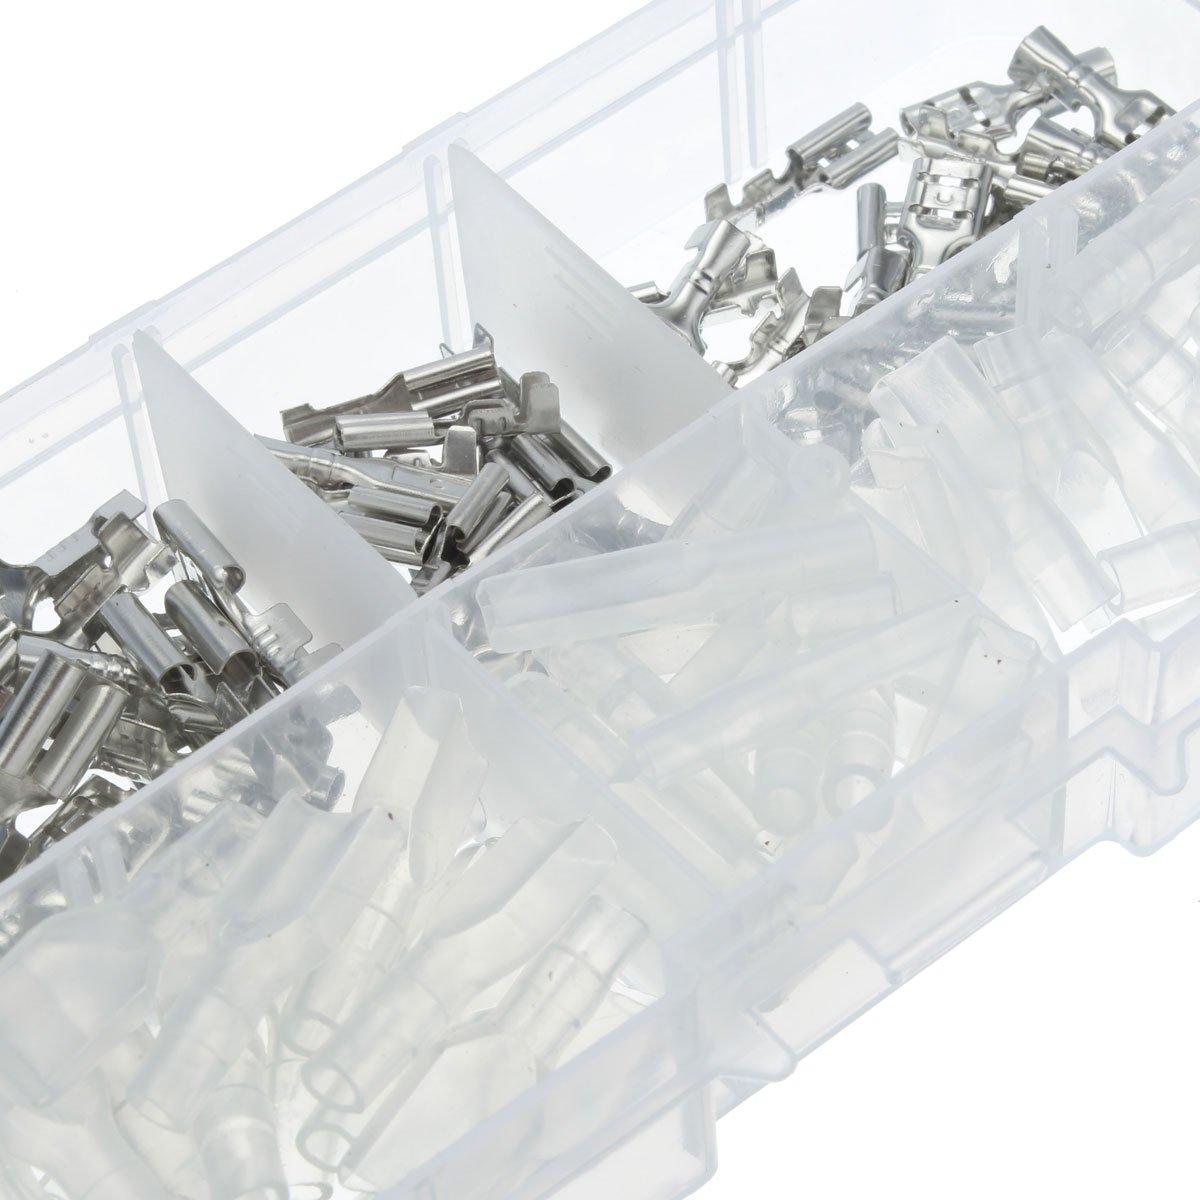 2.8mm 4.8mm 6.3mm Crimp Terminals Female Spade Connectors Insulating Sleeve Kit